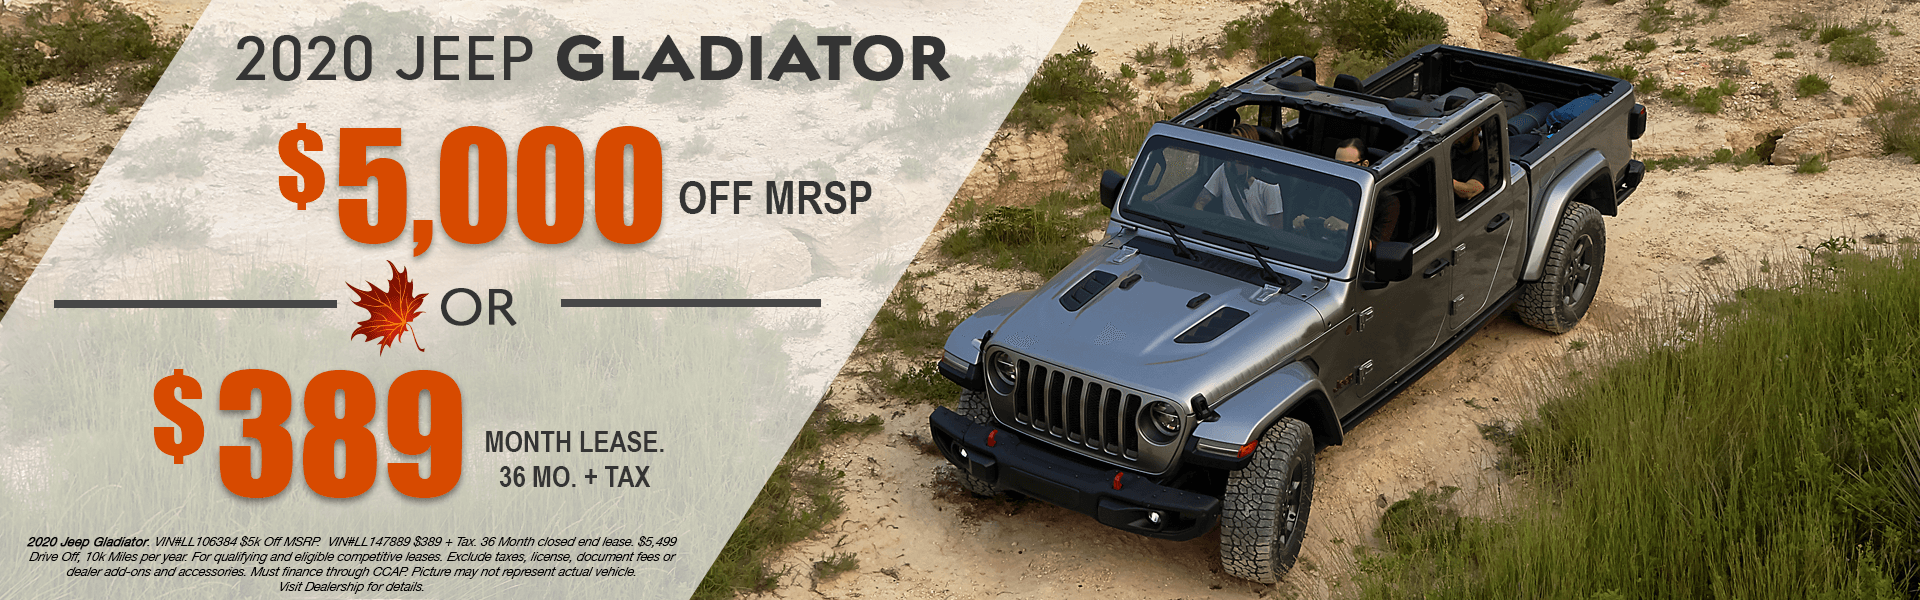 Jeep Gladiator (Lease)-FALL